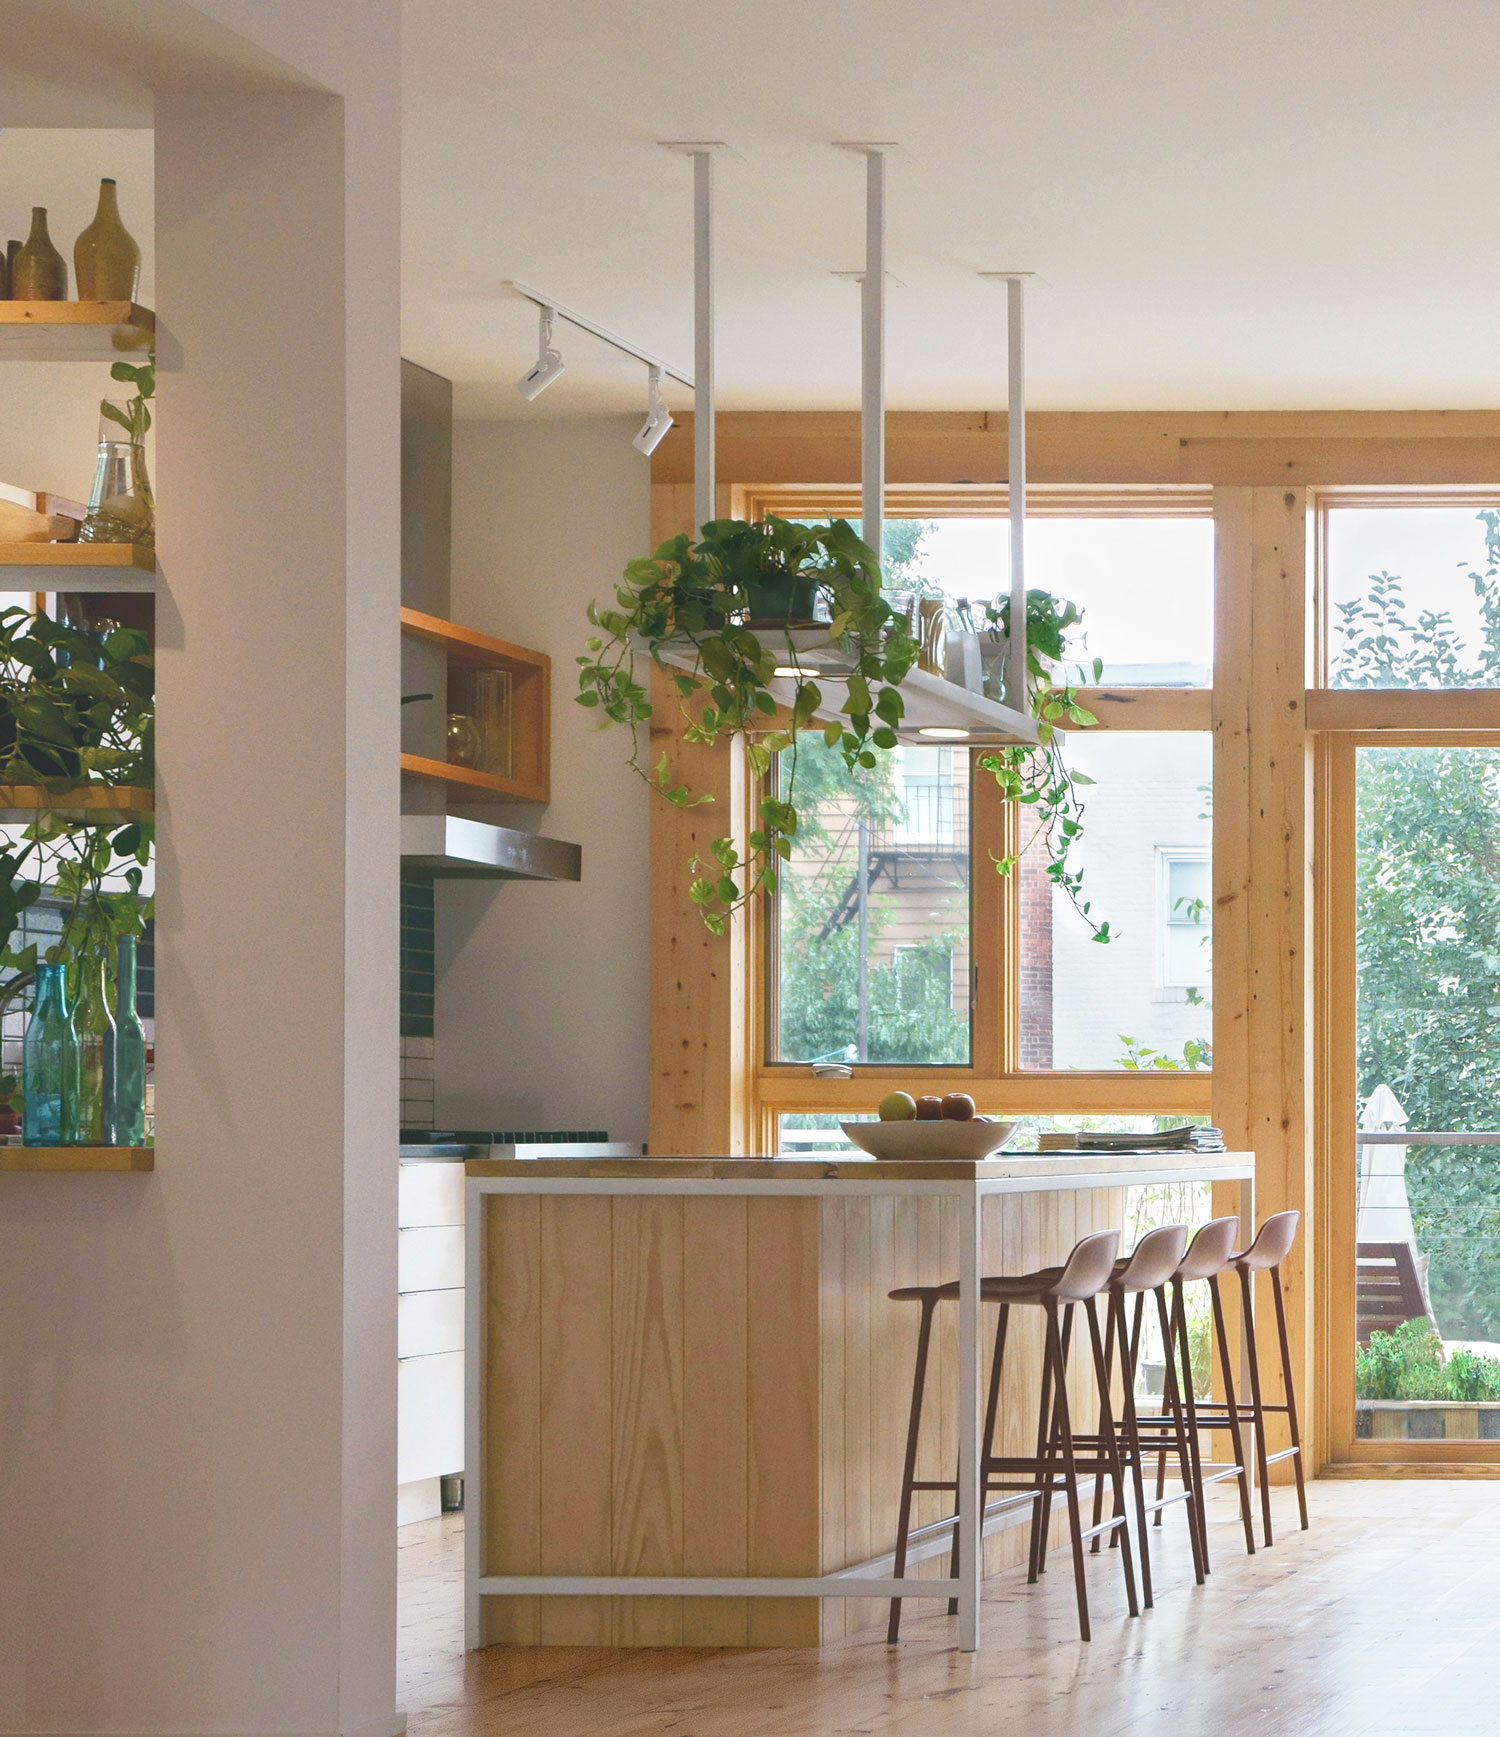 brooklyn-architect-townhouse-renovation5-kitchen-island.jpg